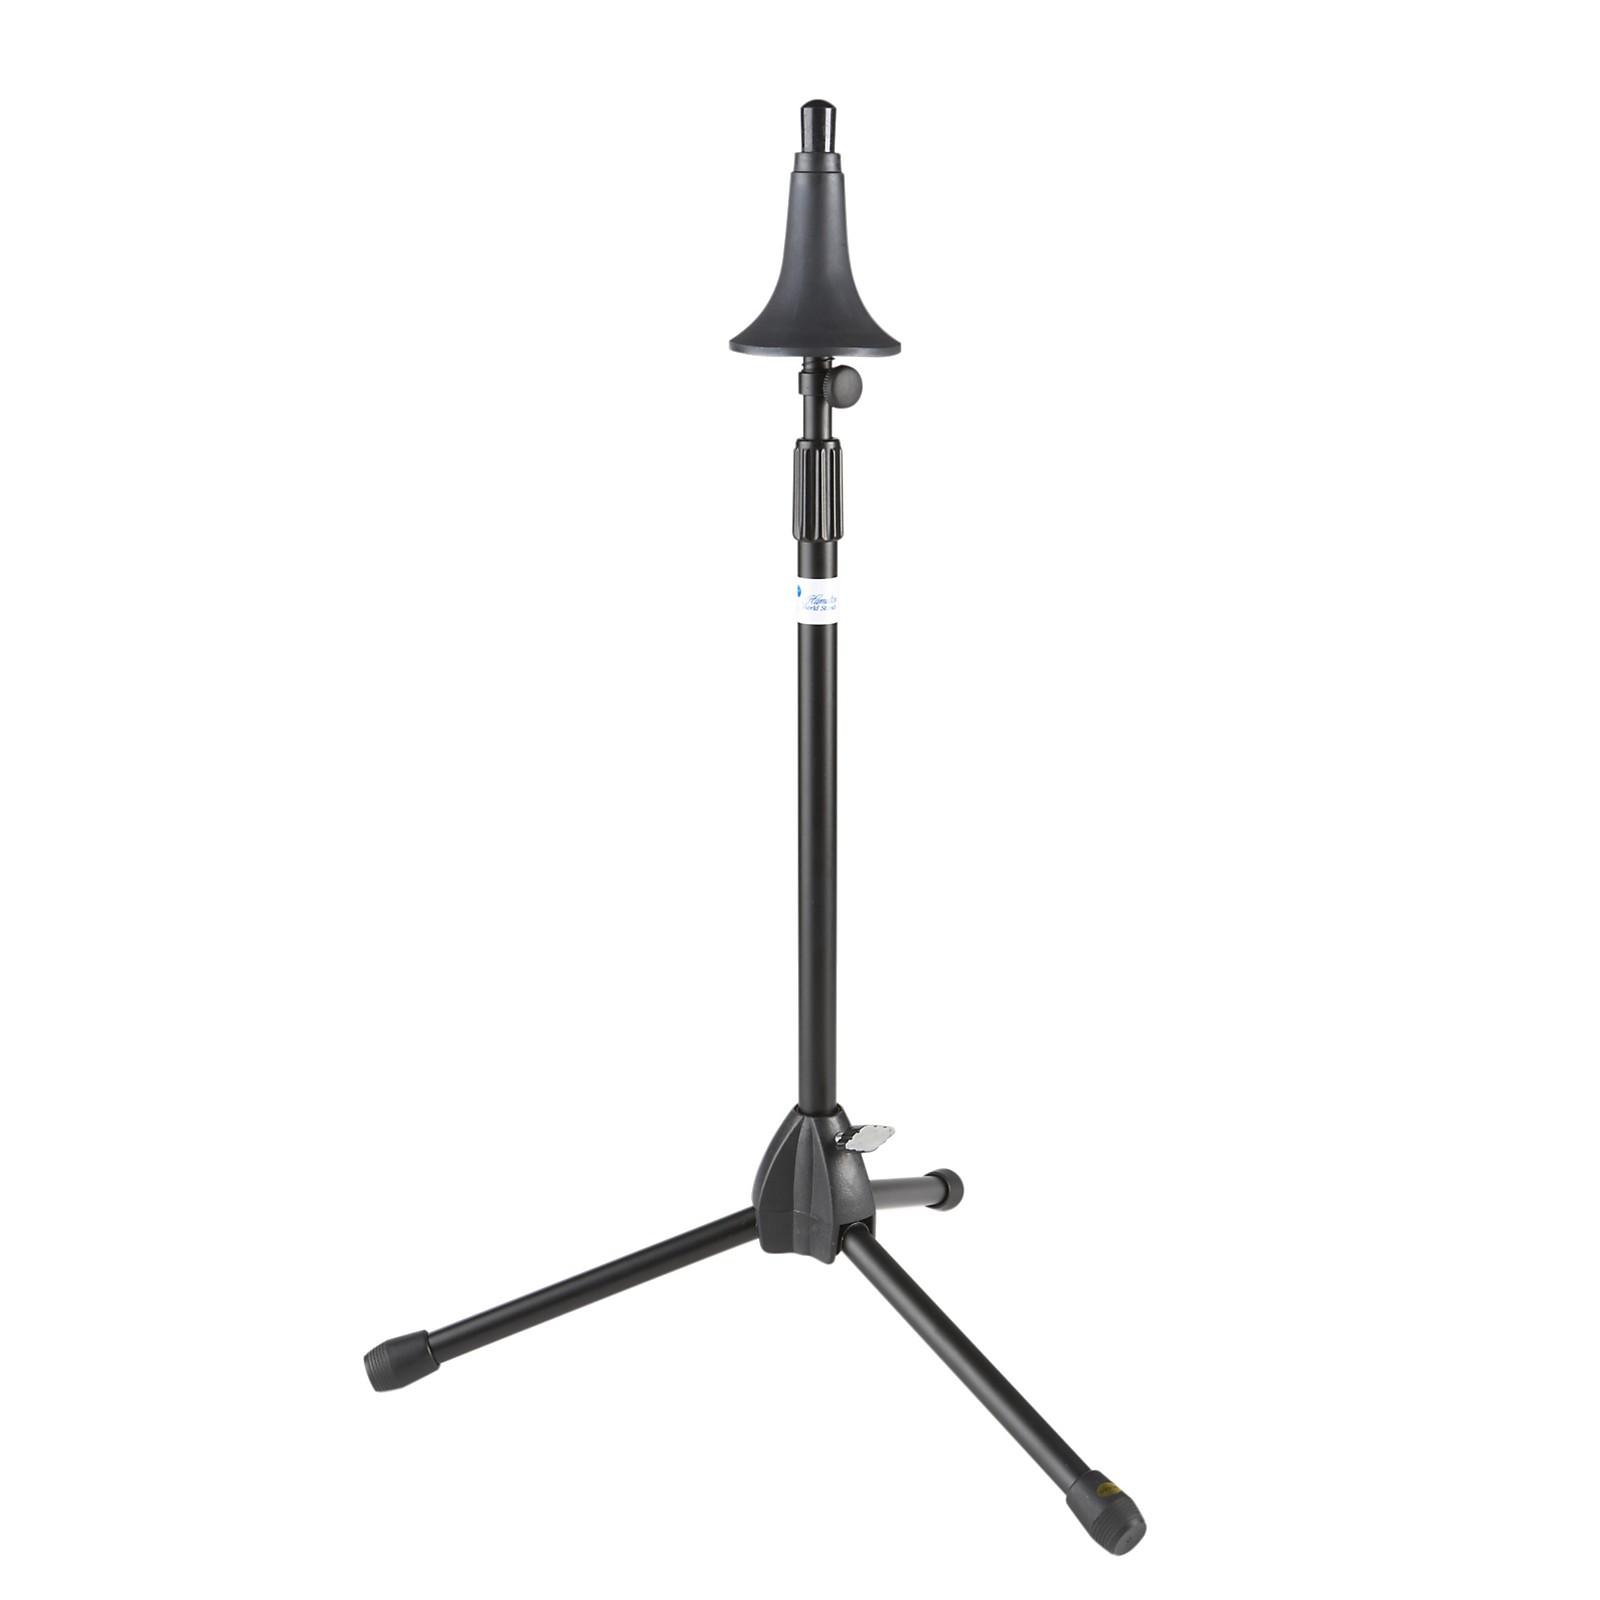 Hamilton KB952 Trombone Stand